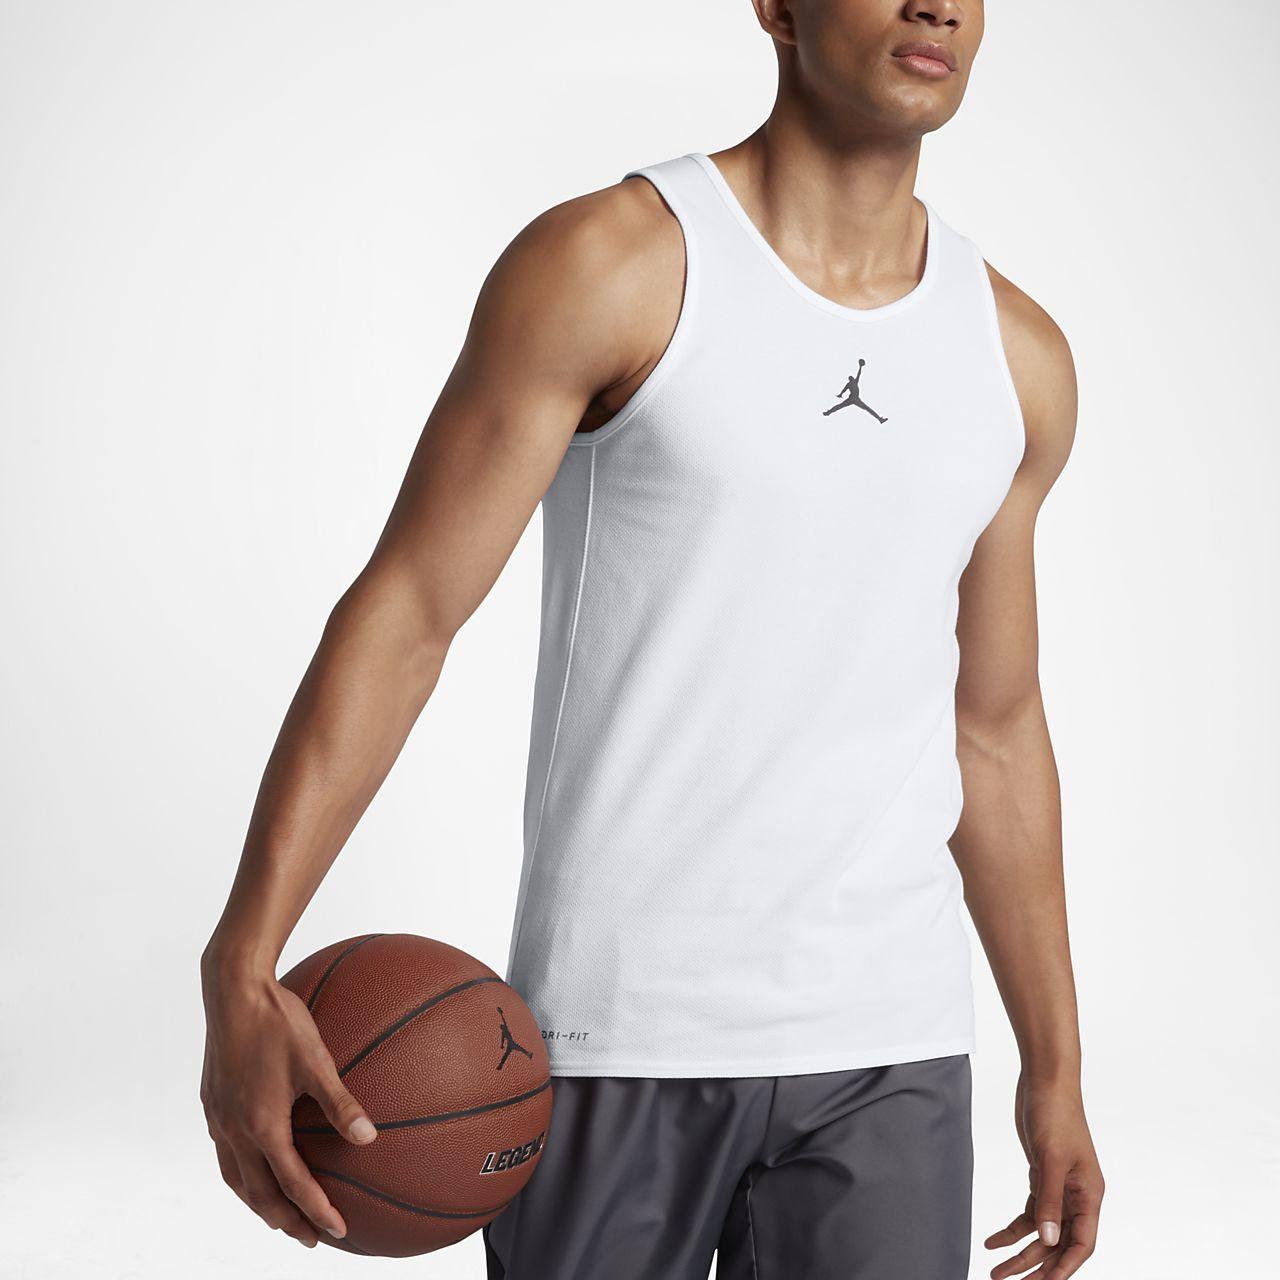 blo mens basketball heads - 736×986